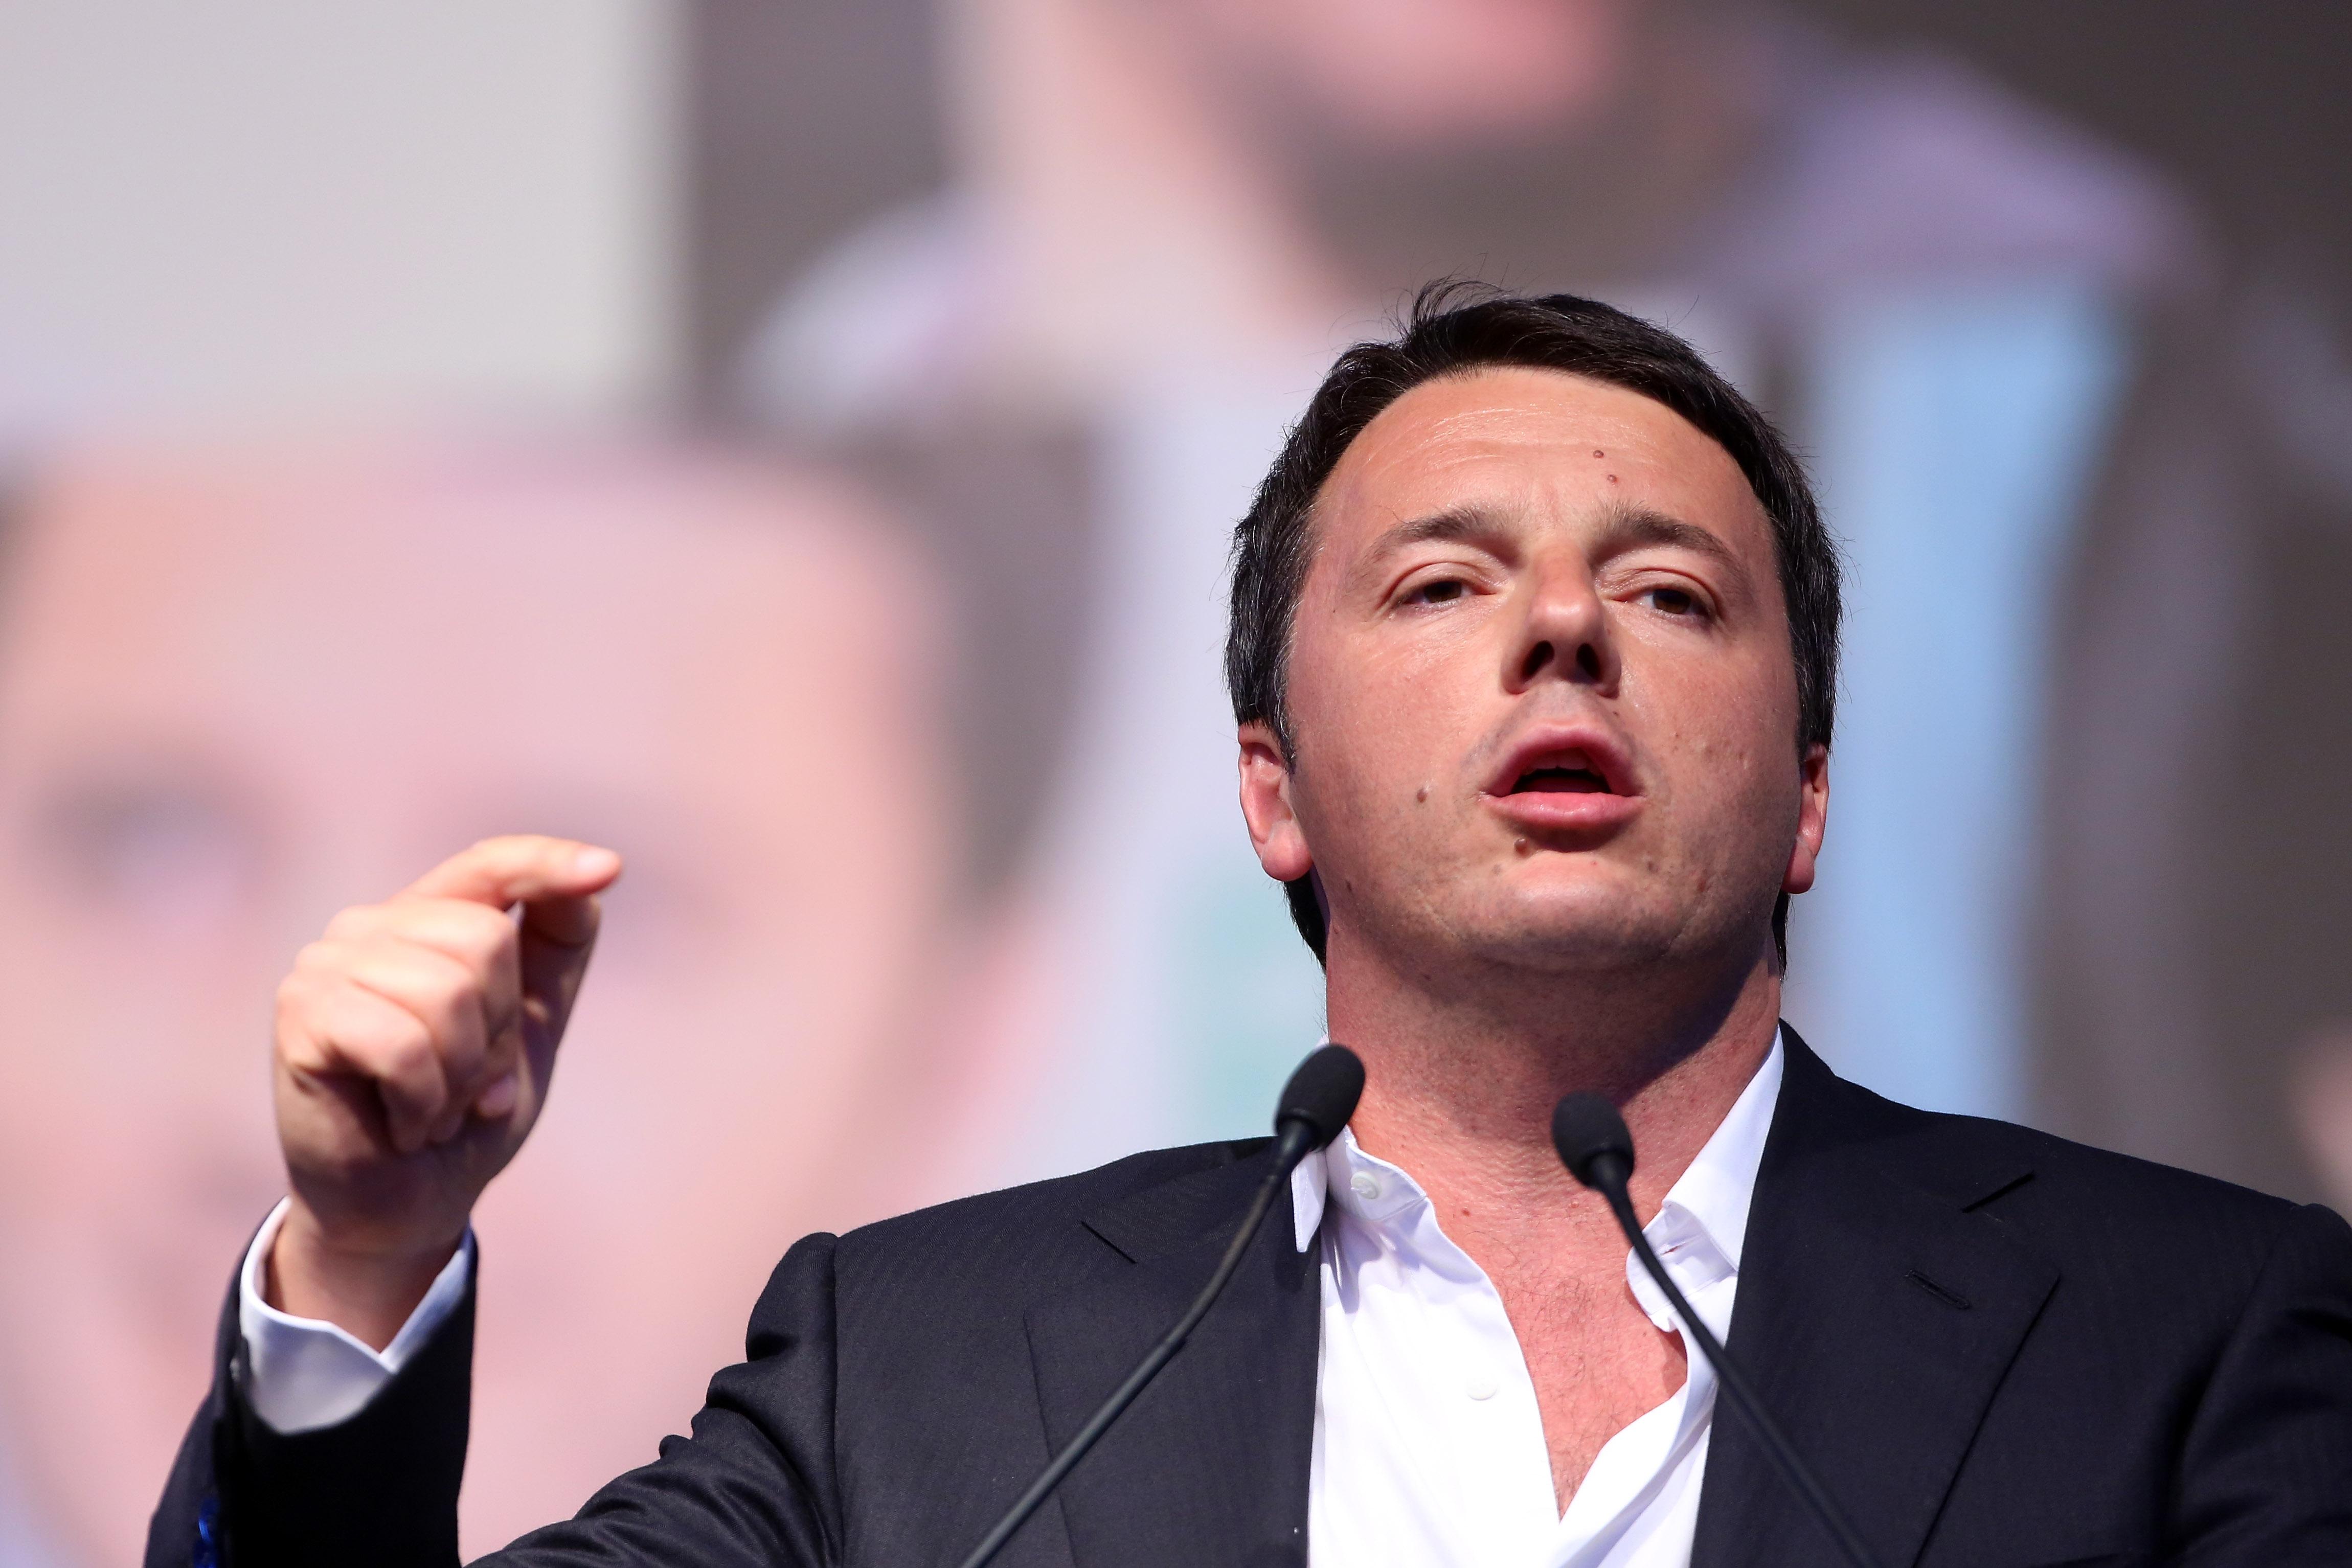 Streit um Flüchtlinge: Renzi droht mit Veto gegen EU-Haushalt